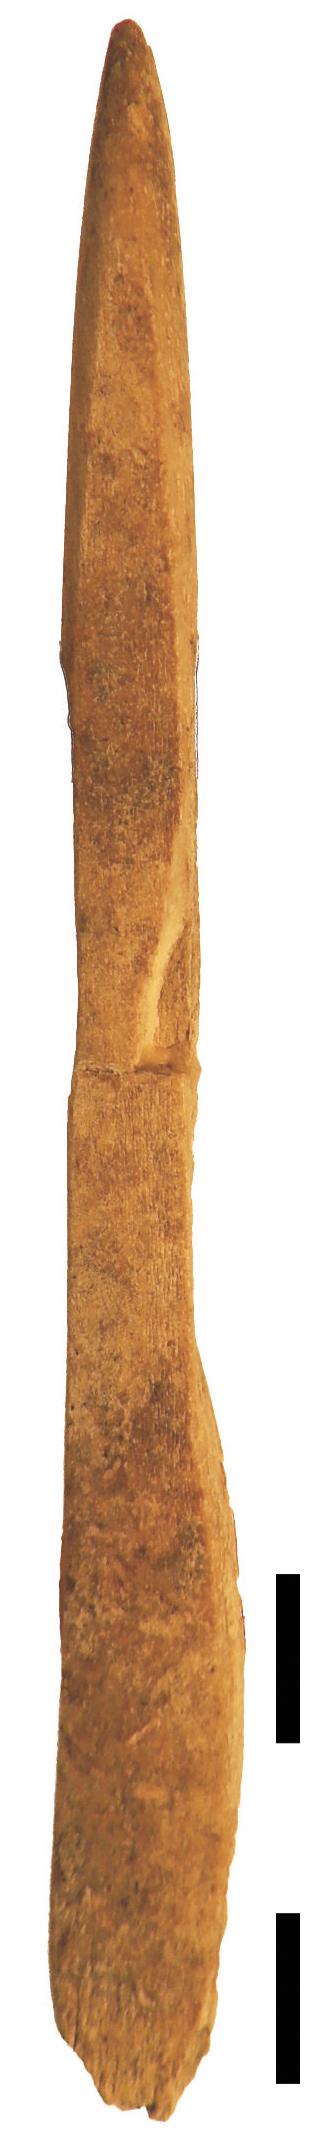 Vârf de os